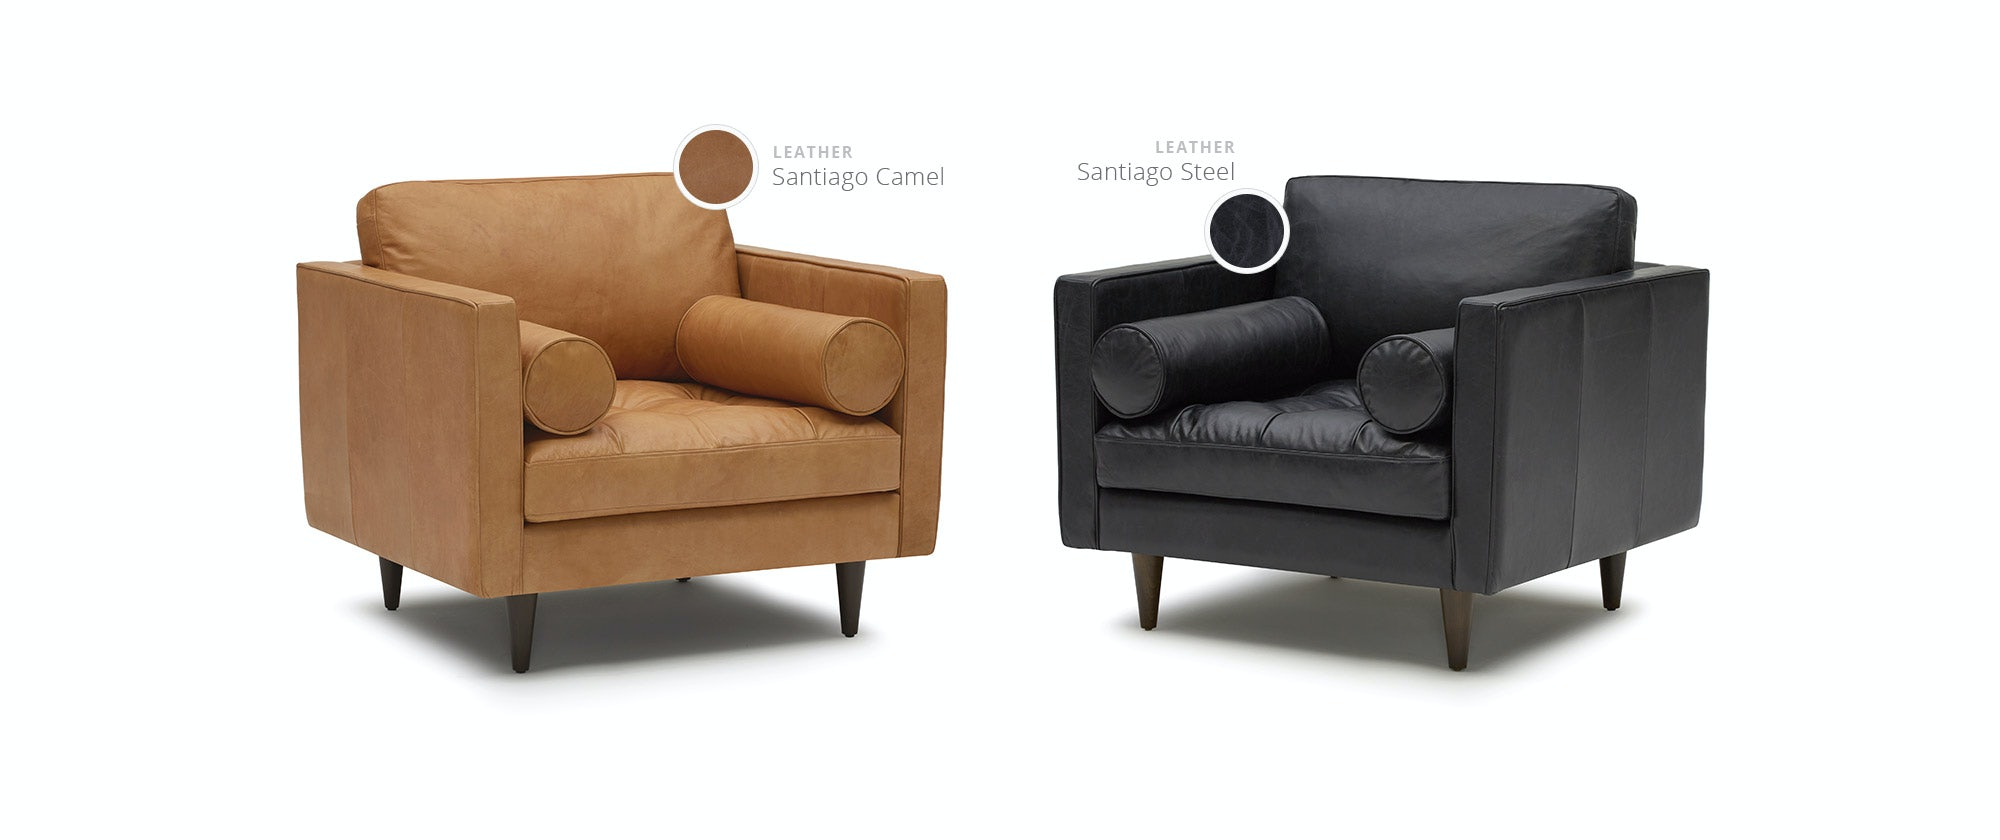 Awe Inspiring Briar Leather Chair Evergreenethics Interior Chair Design Evergreenethicsorg